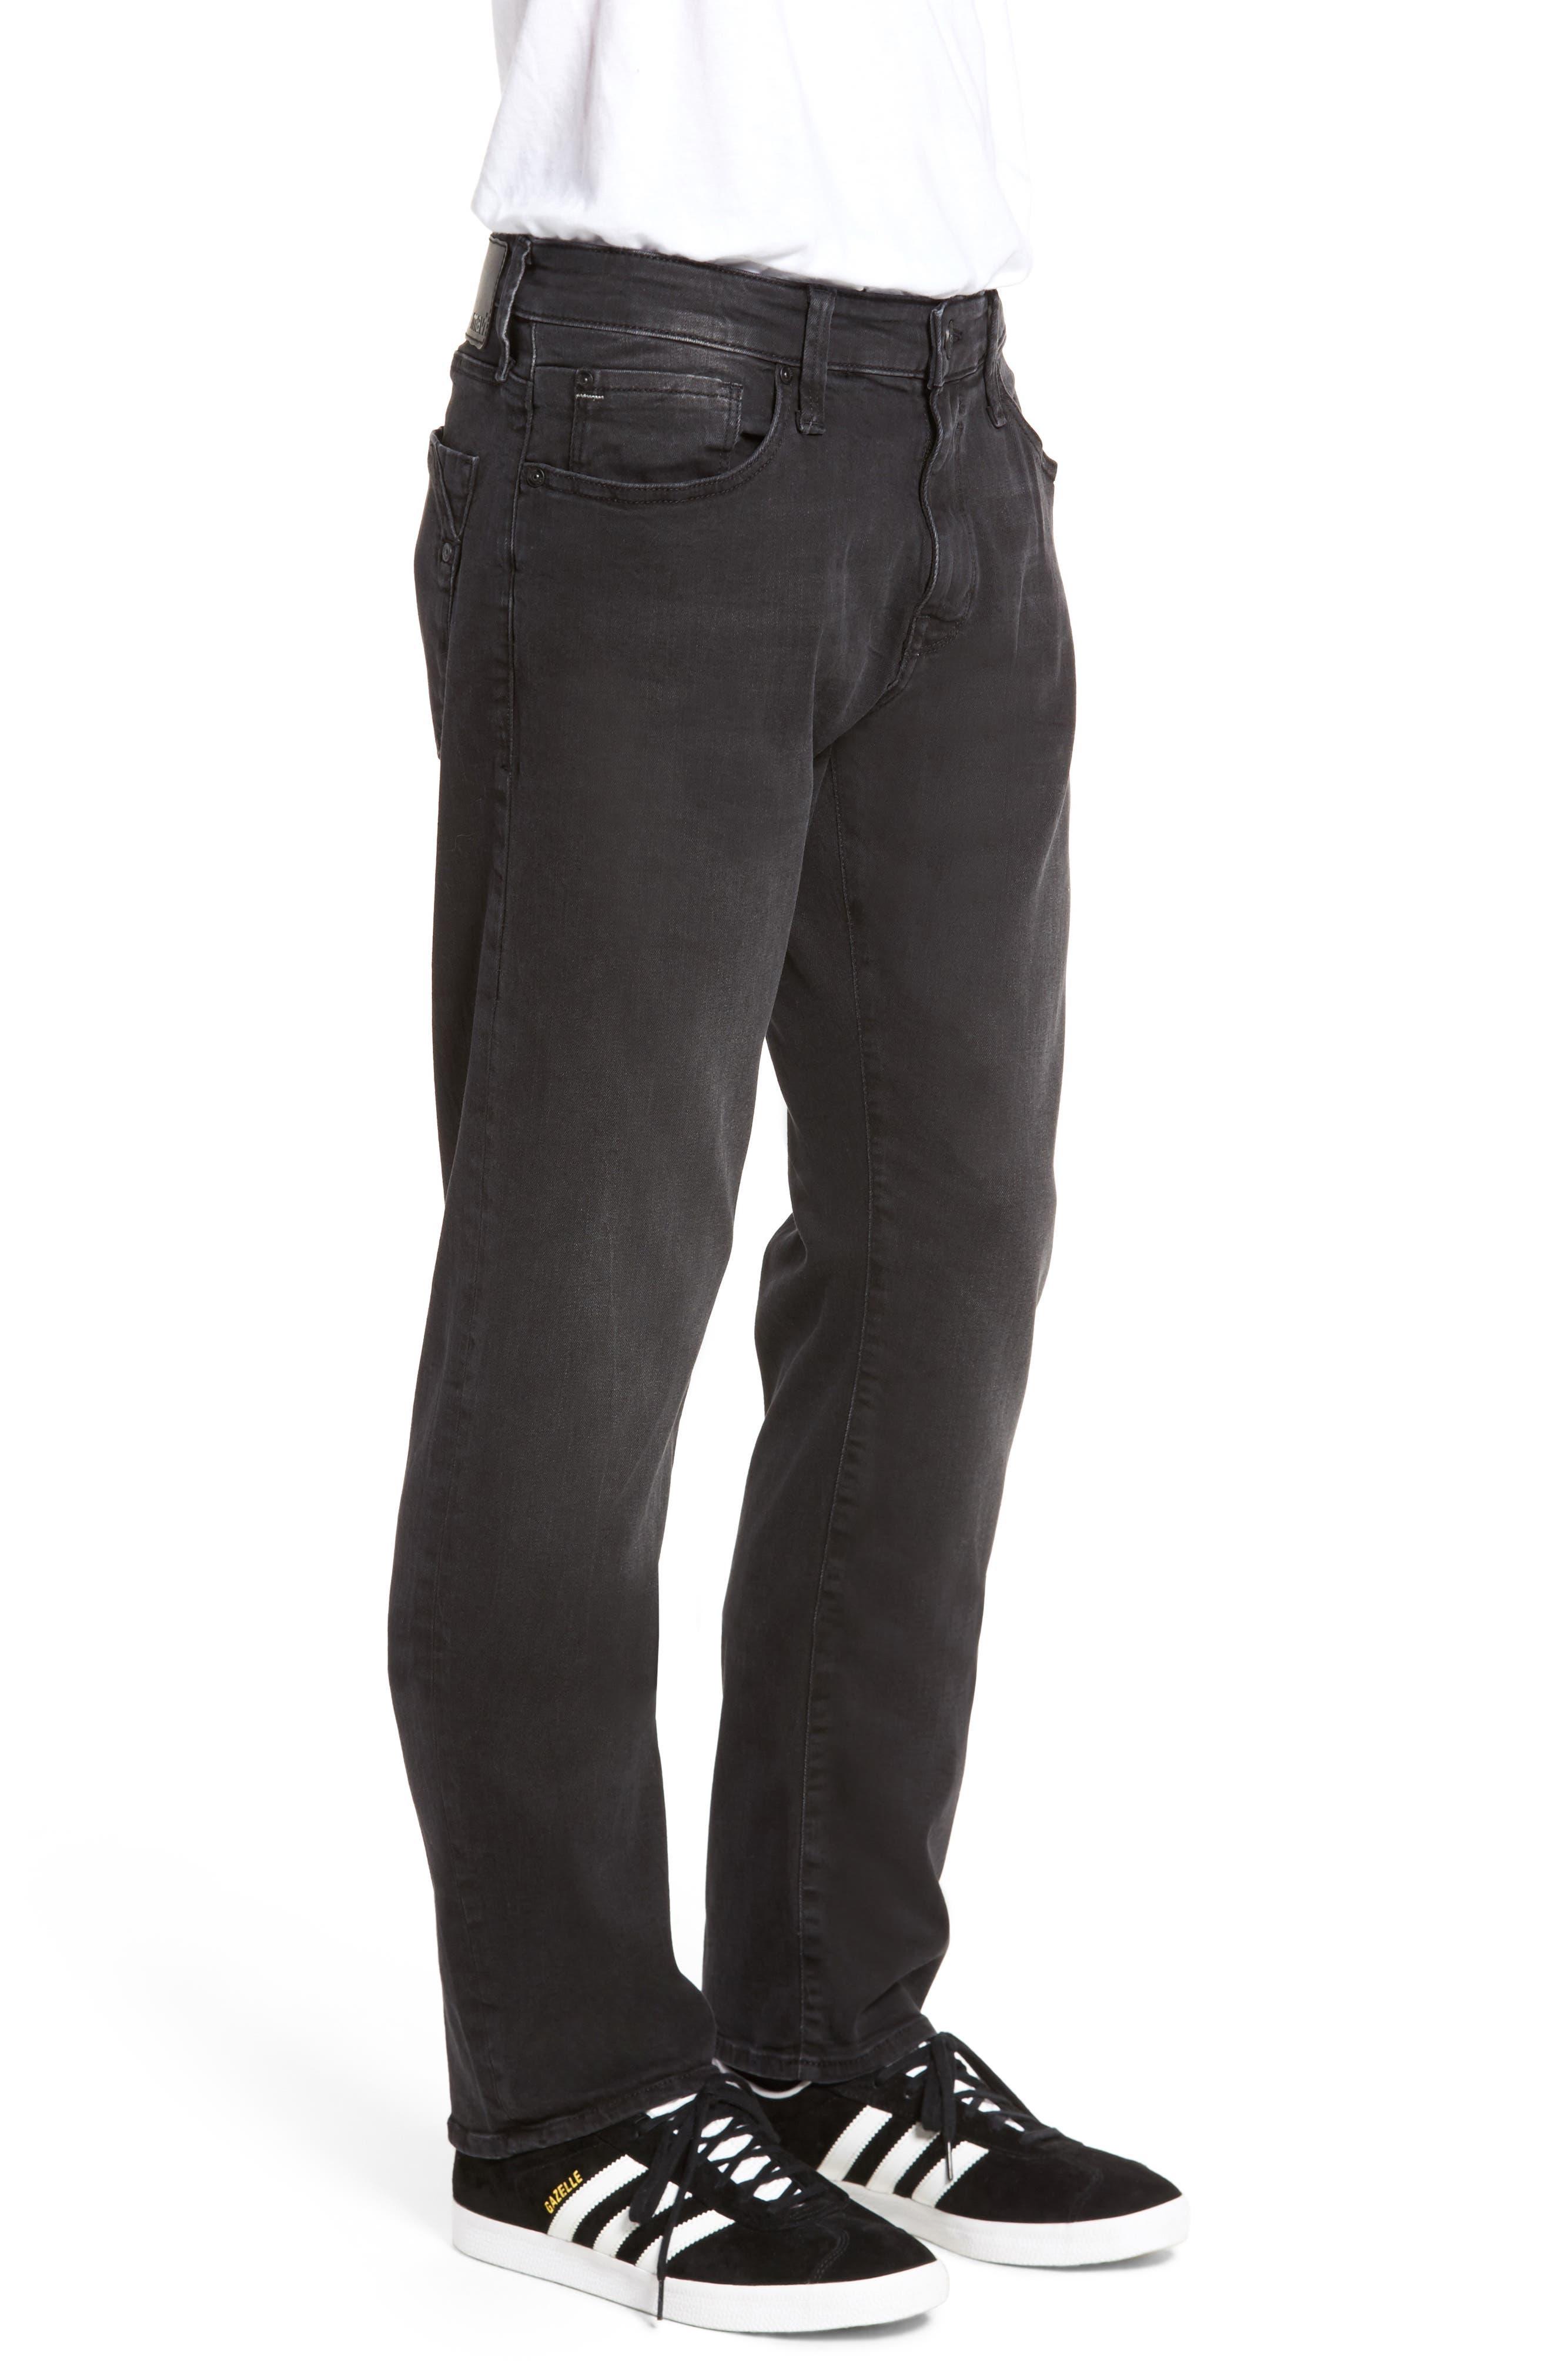 Zach Straight Fit Jeans,                             Alternate thumbnail 3, color,                             050